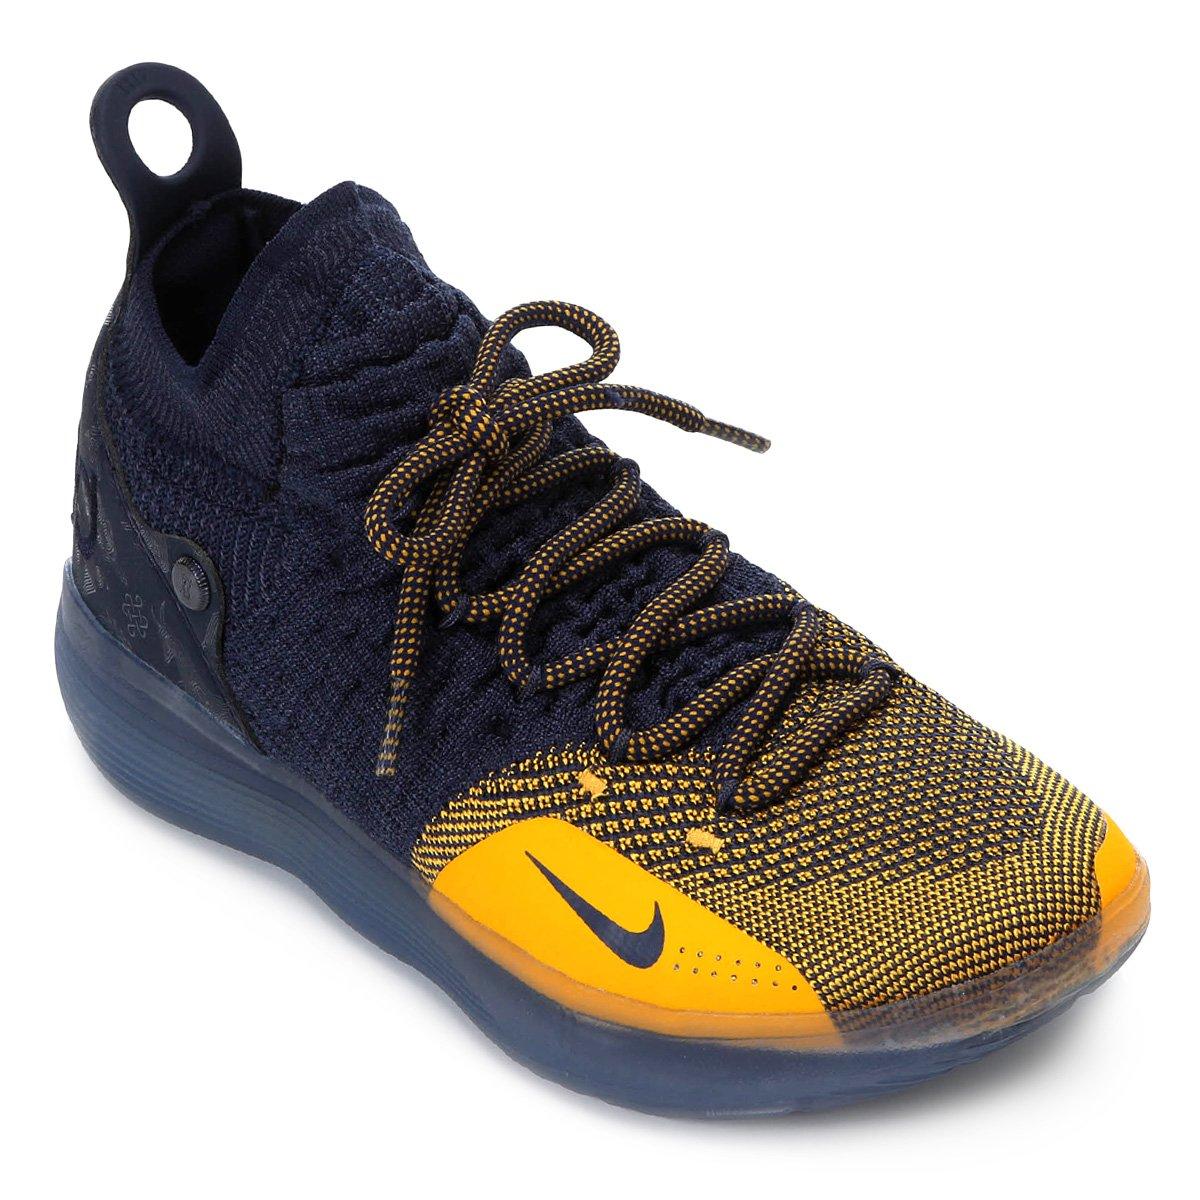 2633d7abd3 Tênis Nike Zoom KD 11 Masculino - Marinho e Laranja - Compre Agora ...